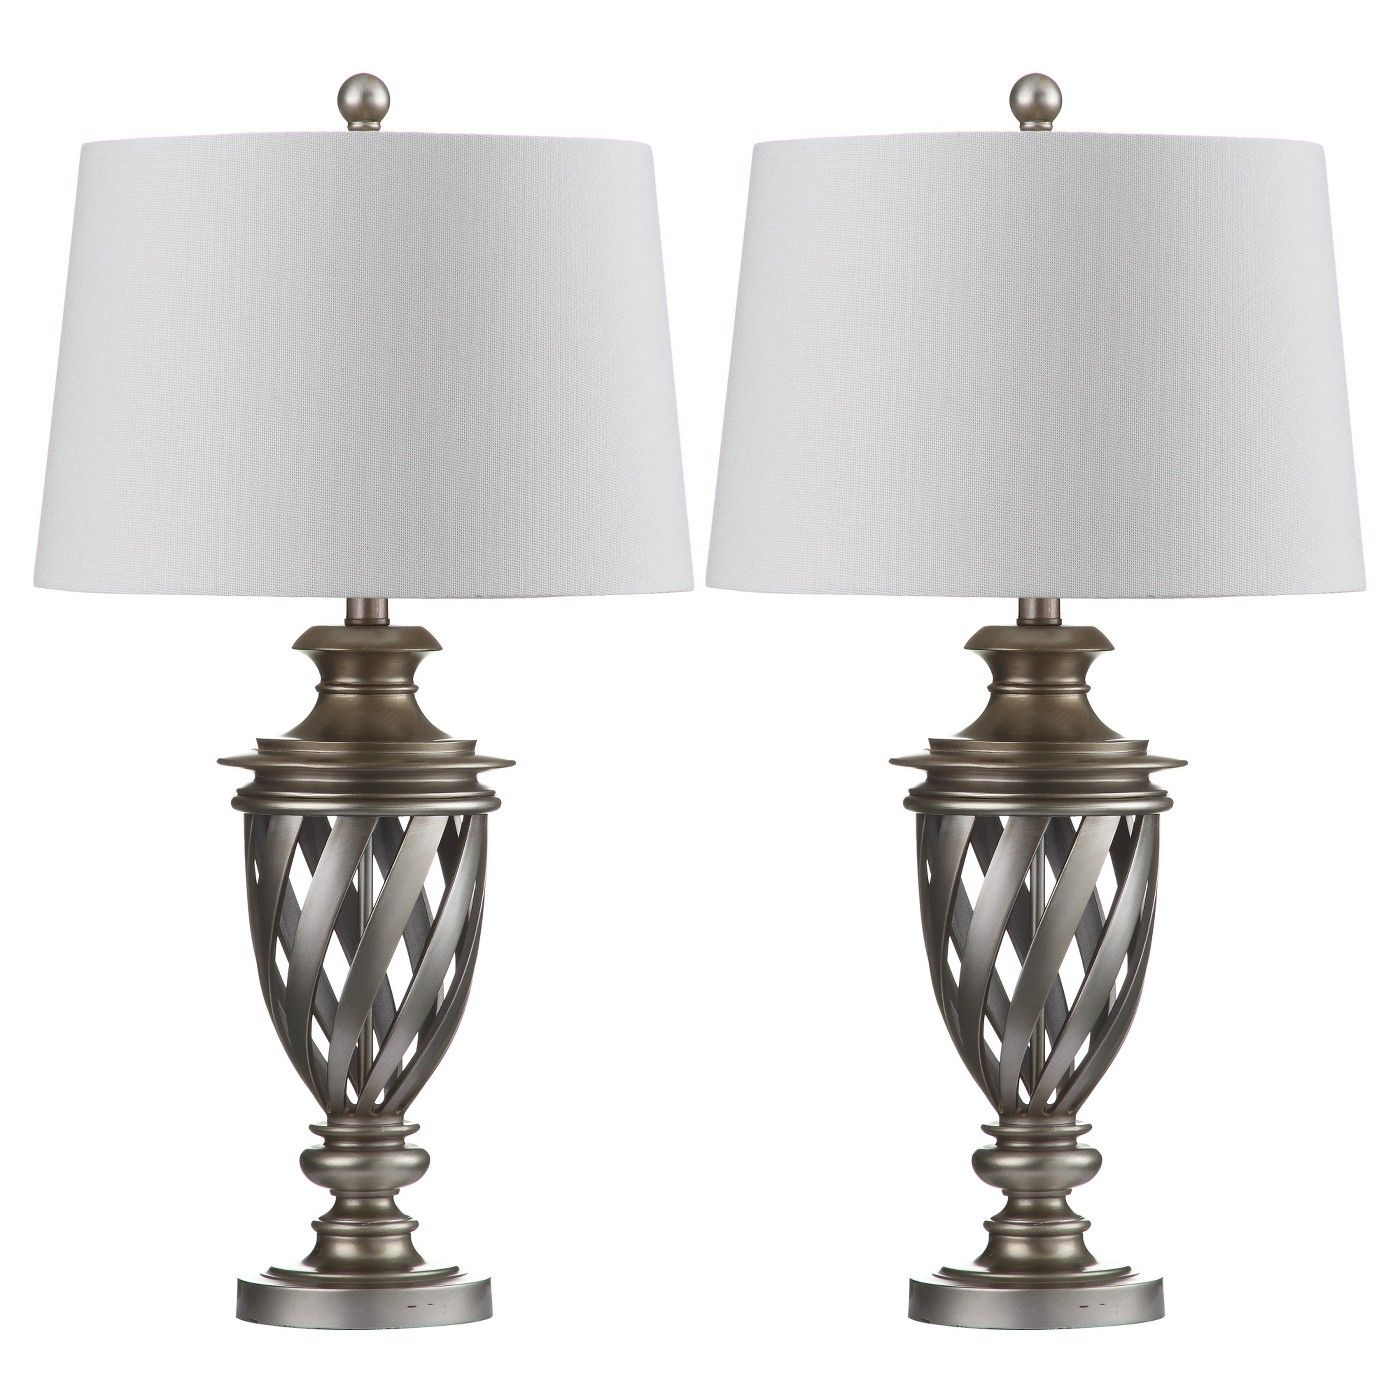 Byron Urn Table Lamp Set Of 2 Safavieh Target Silver Table Lamps Table Lamp Sets Table Lamp